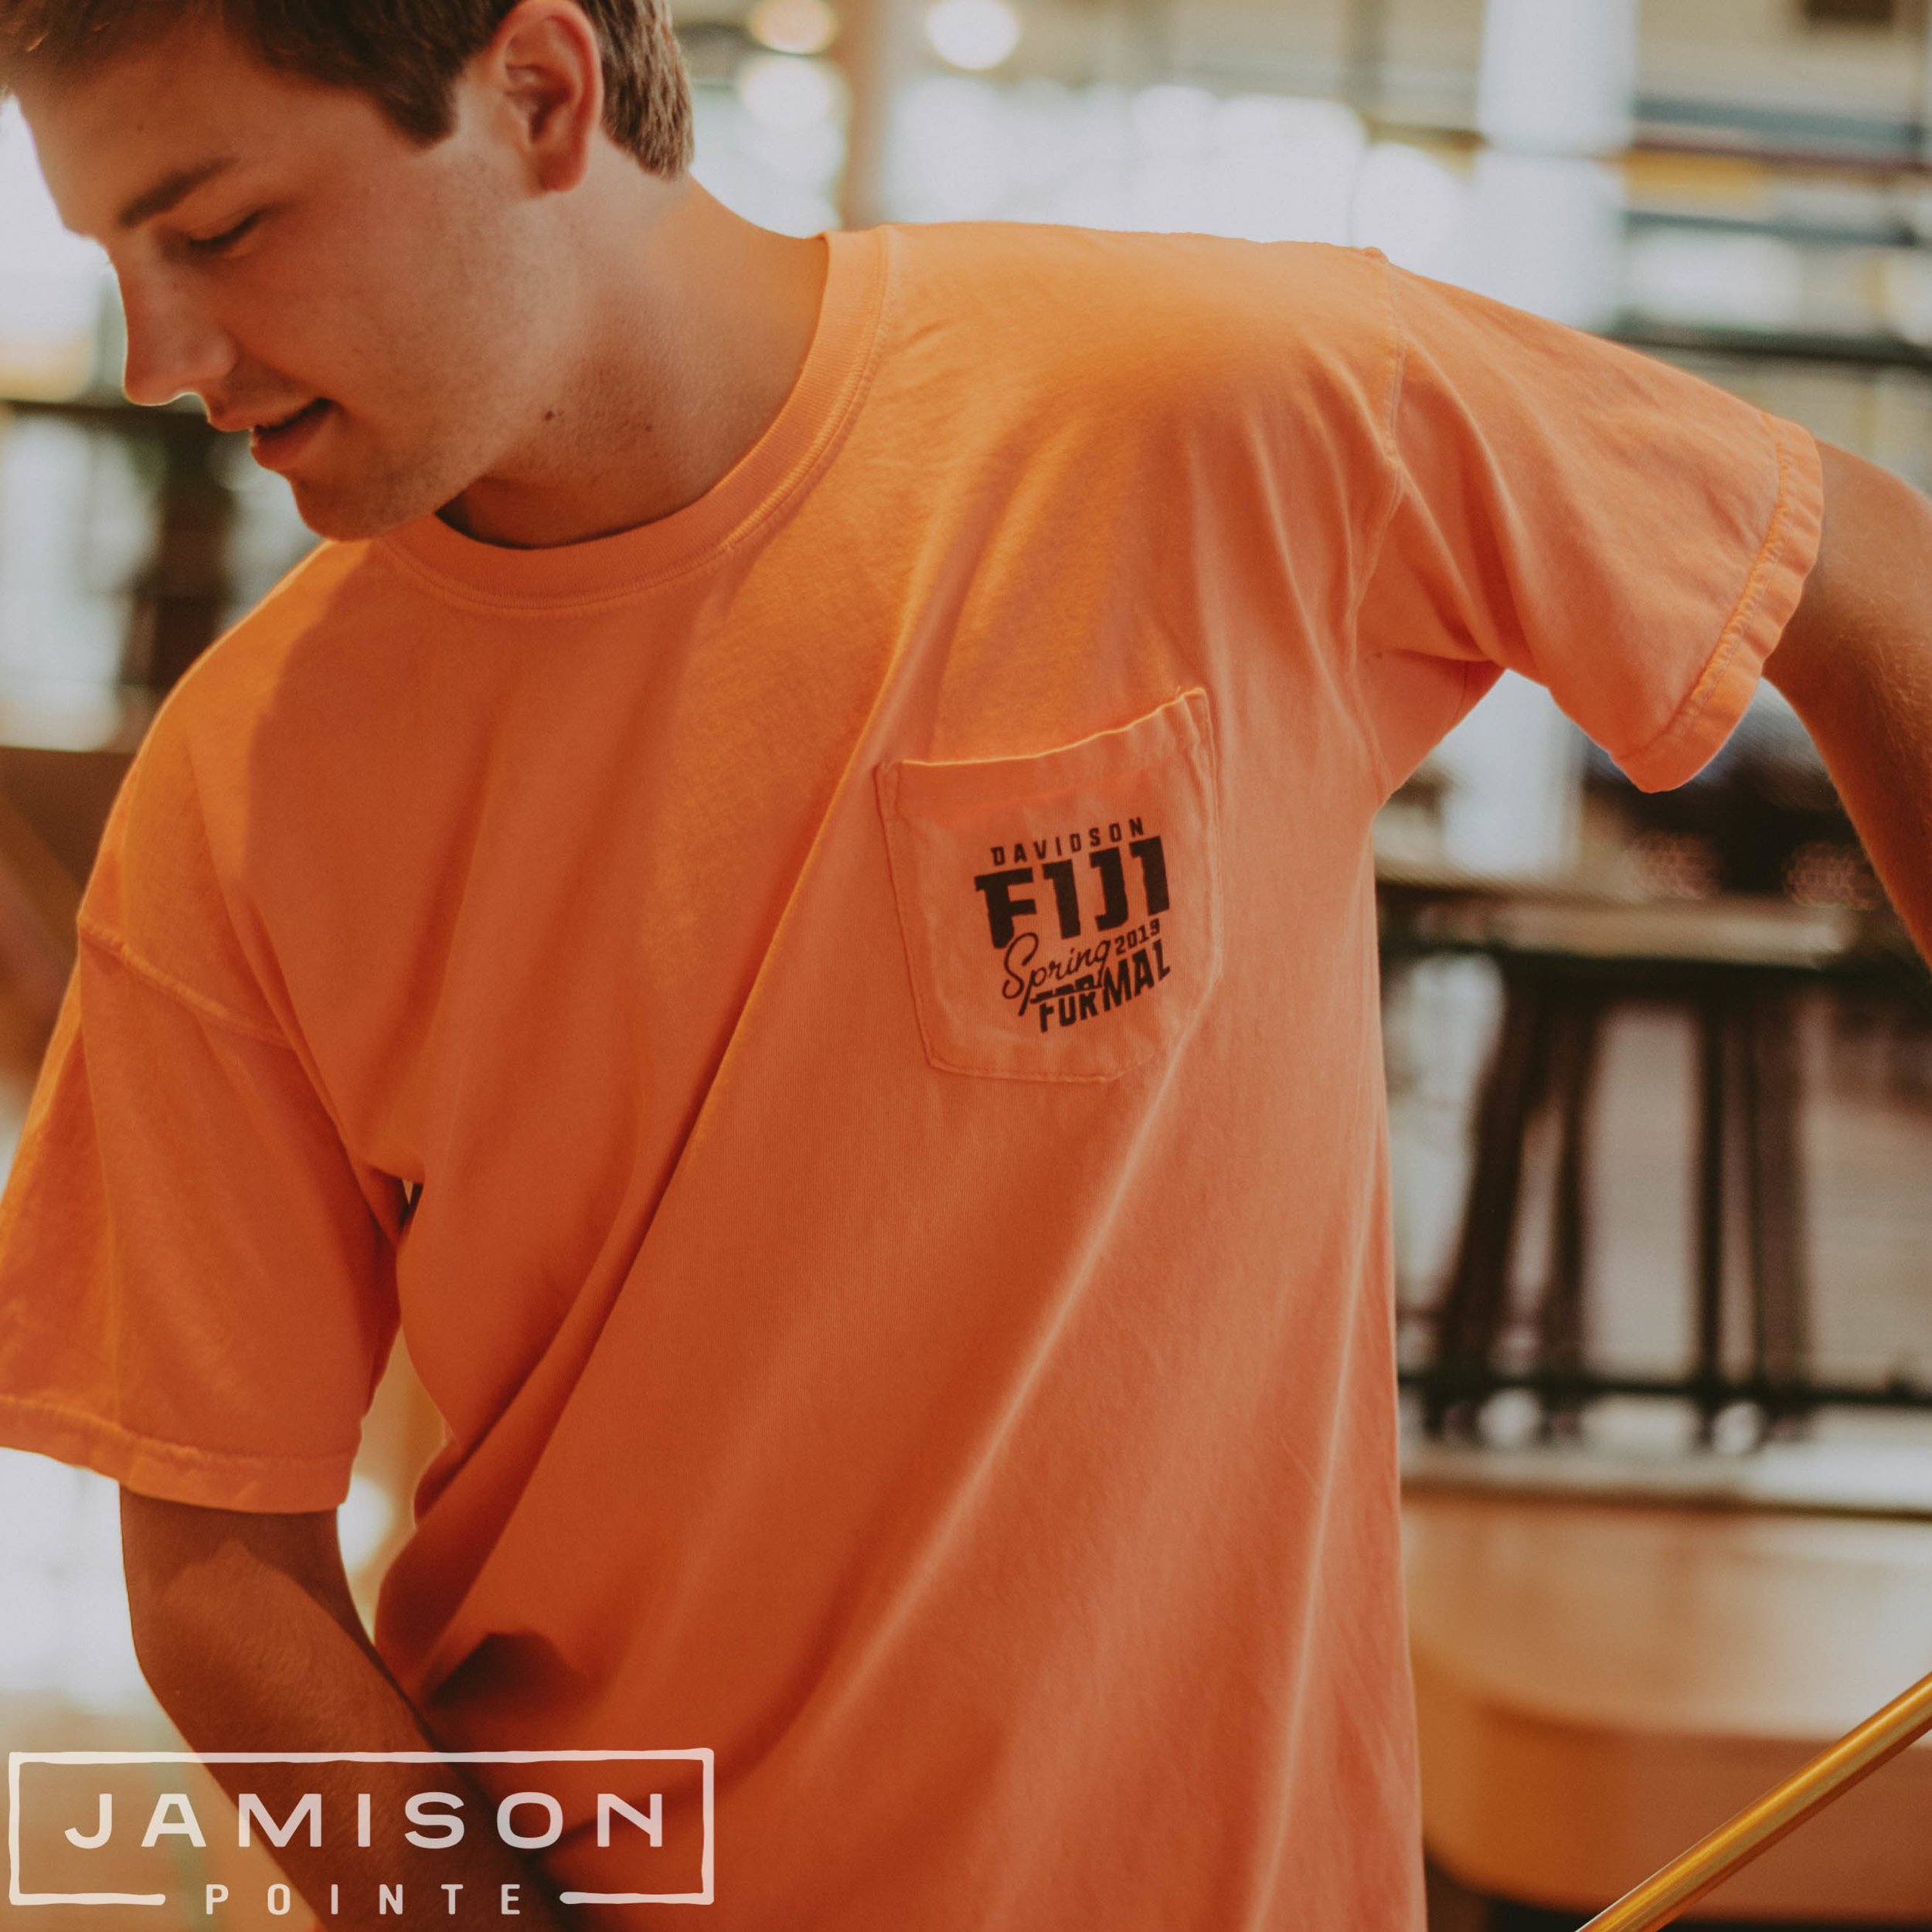 FIJI Spring Formal Tshirt